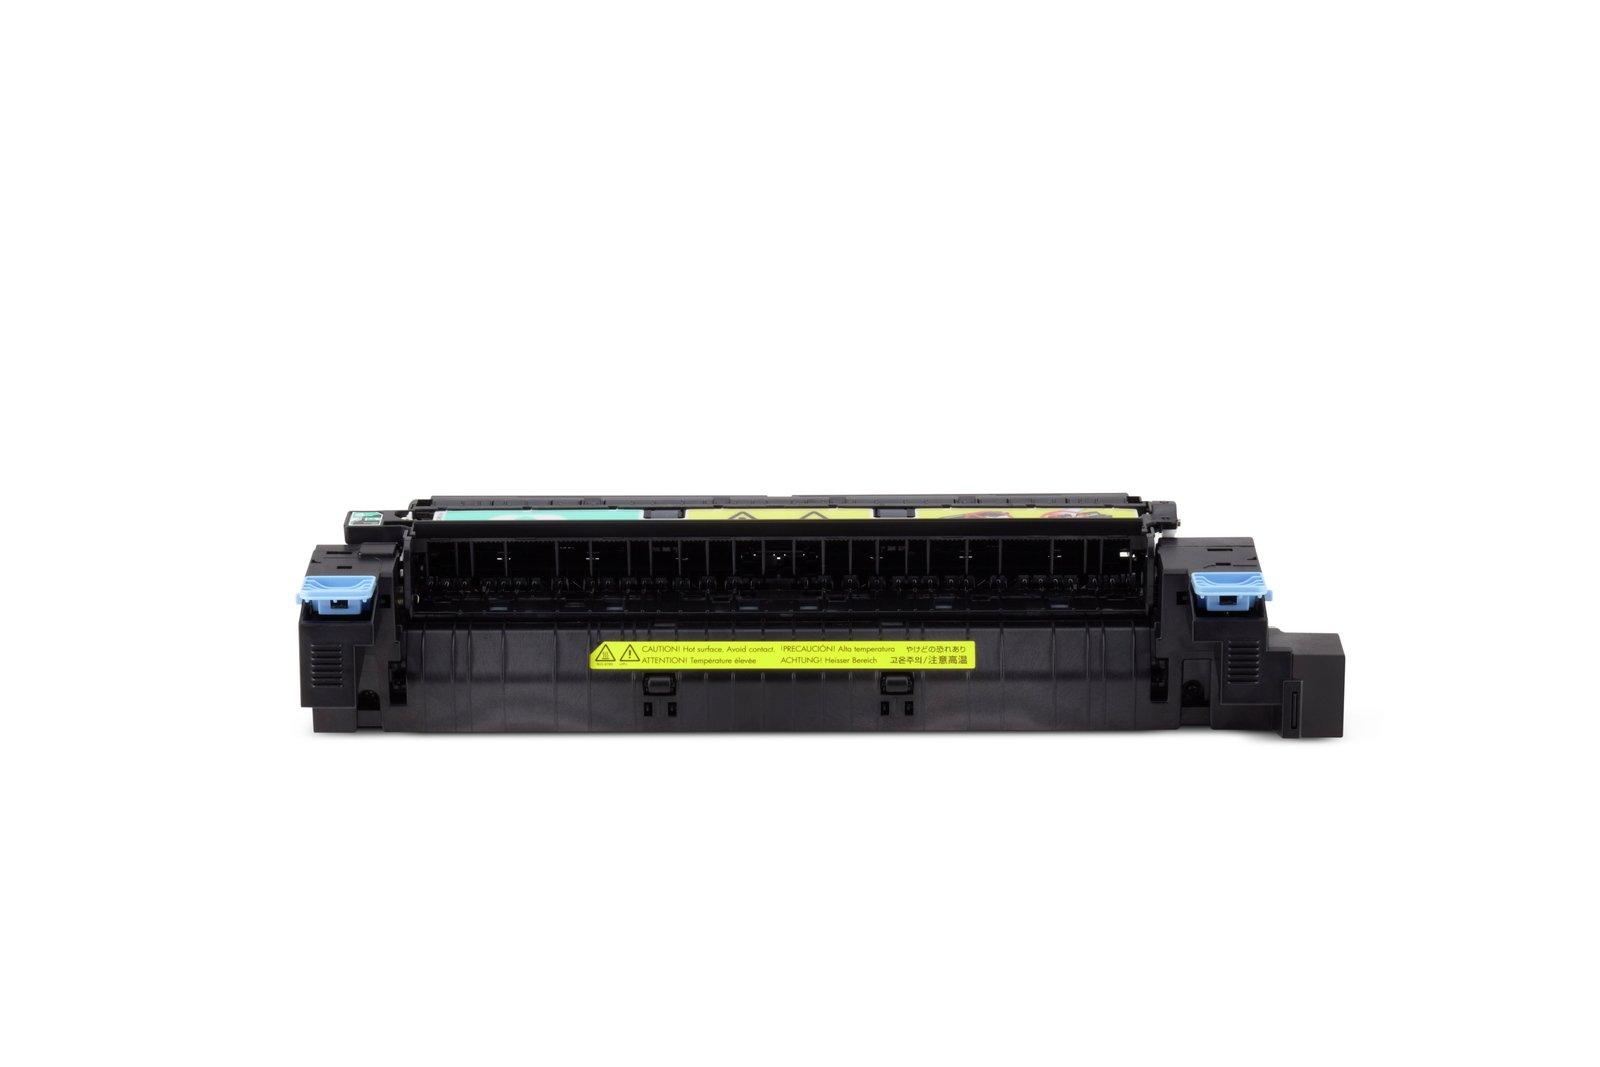 HP L0H24A Original Printer Maintenance Kit by HP